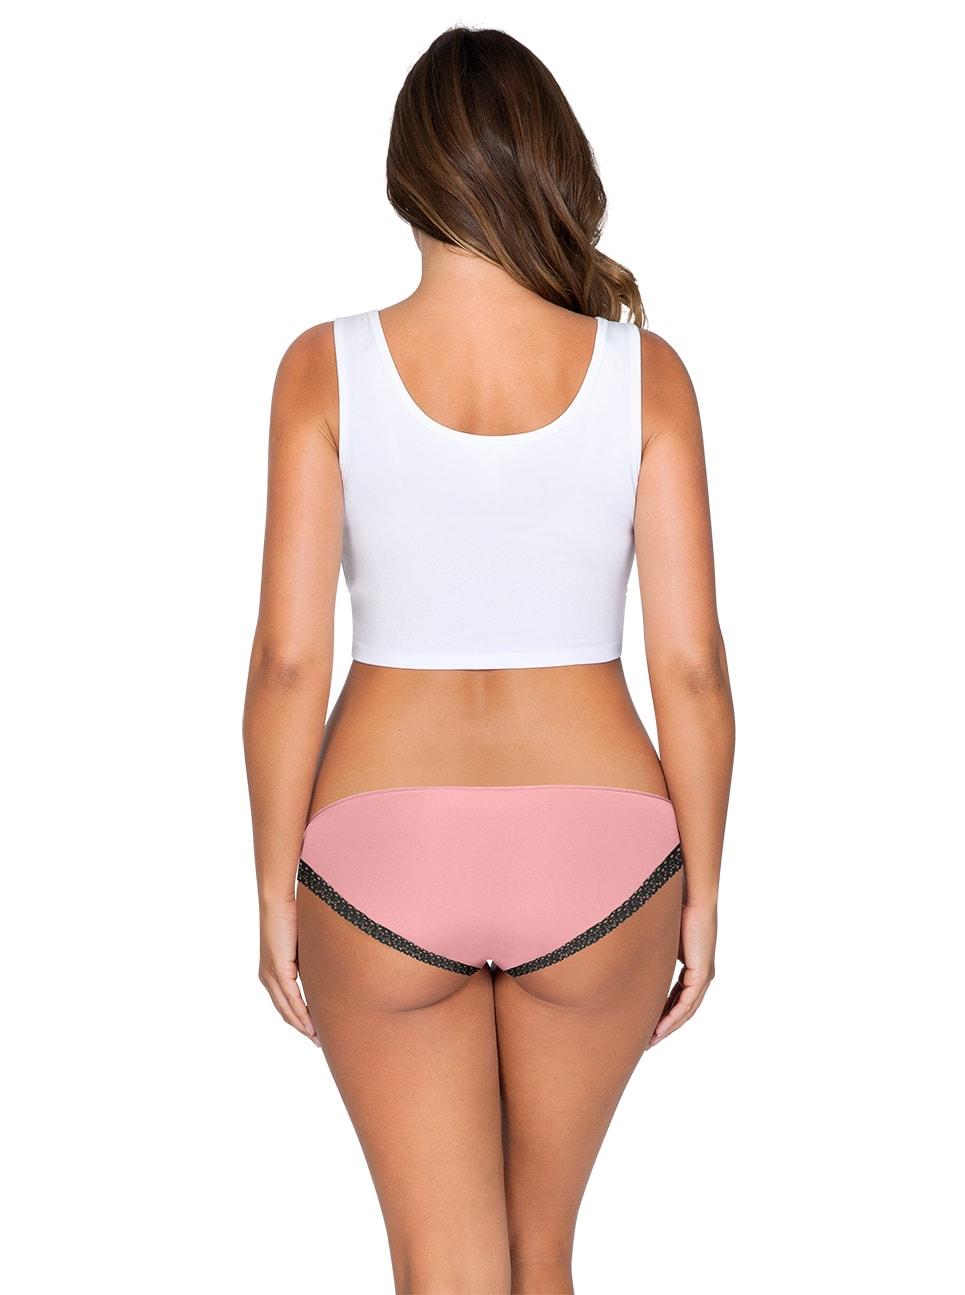 ParfaitPanty Solovely Bikini PP301 D PinkBack - So Lovely Bikini Quartz Pink PP301